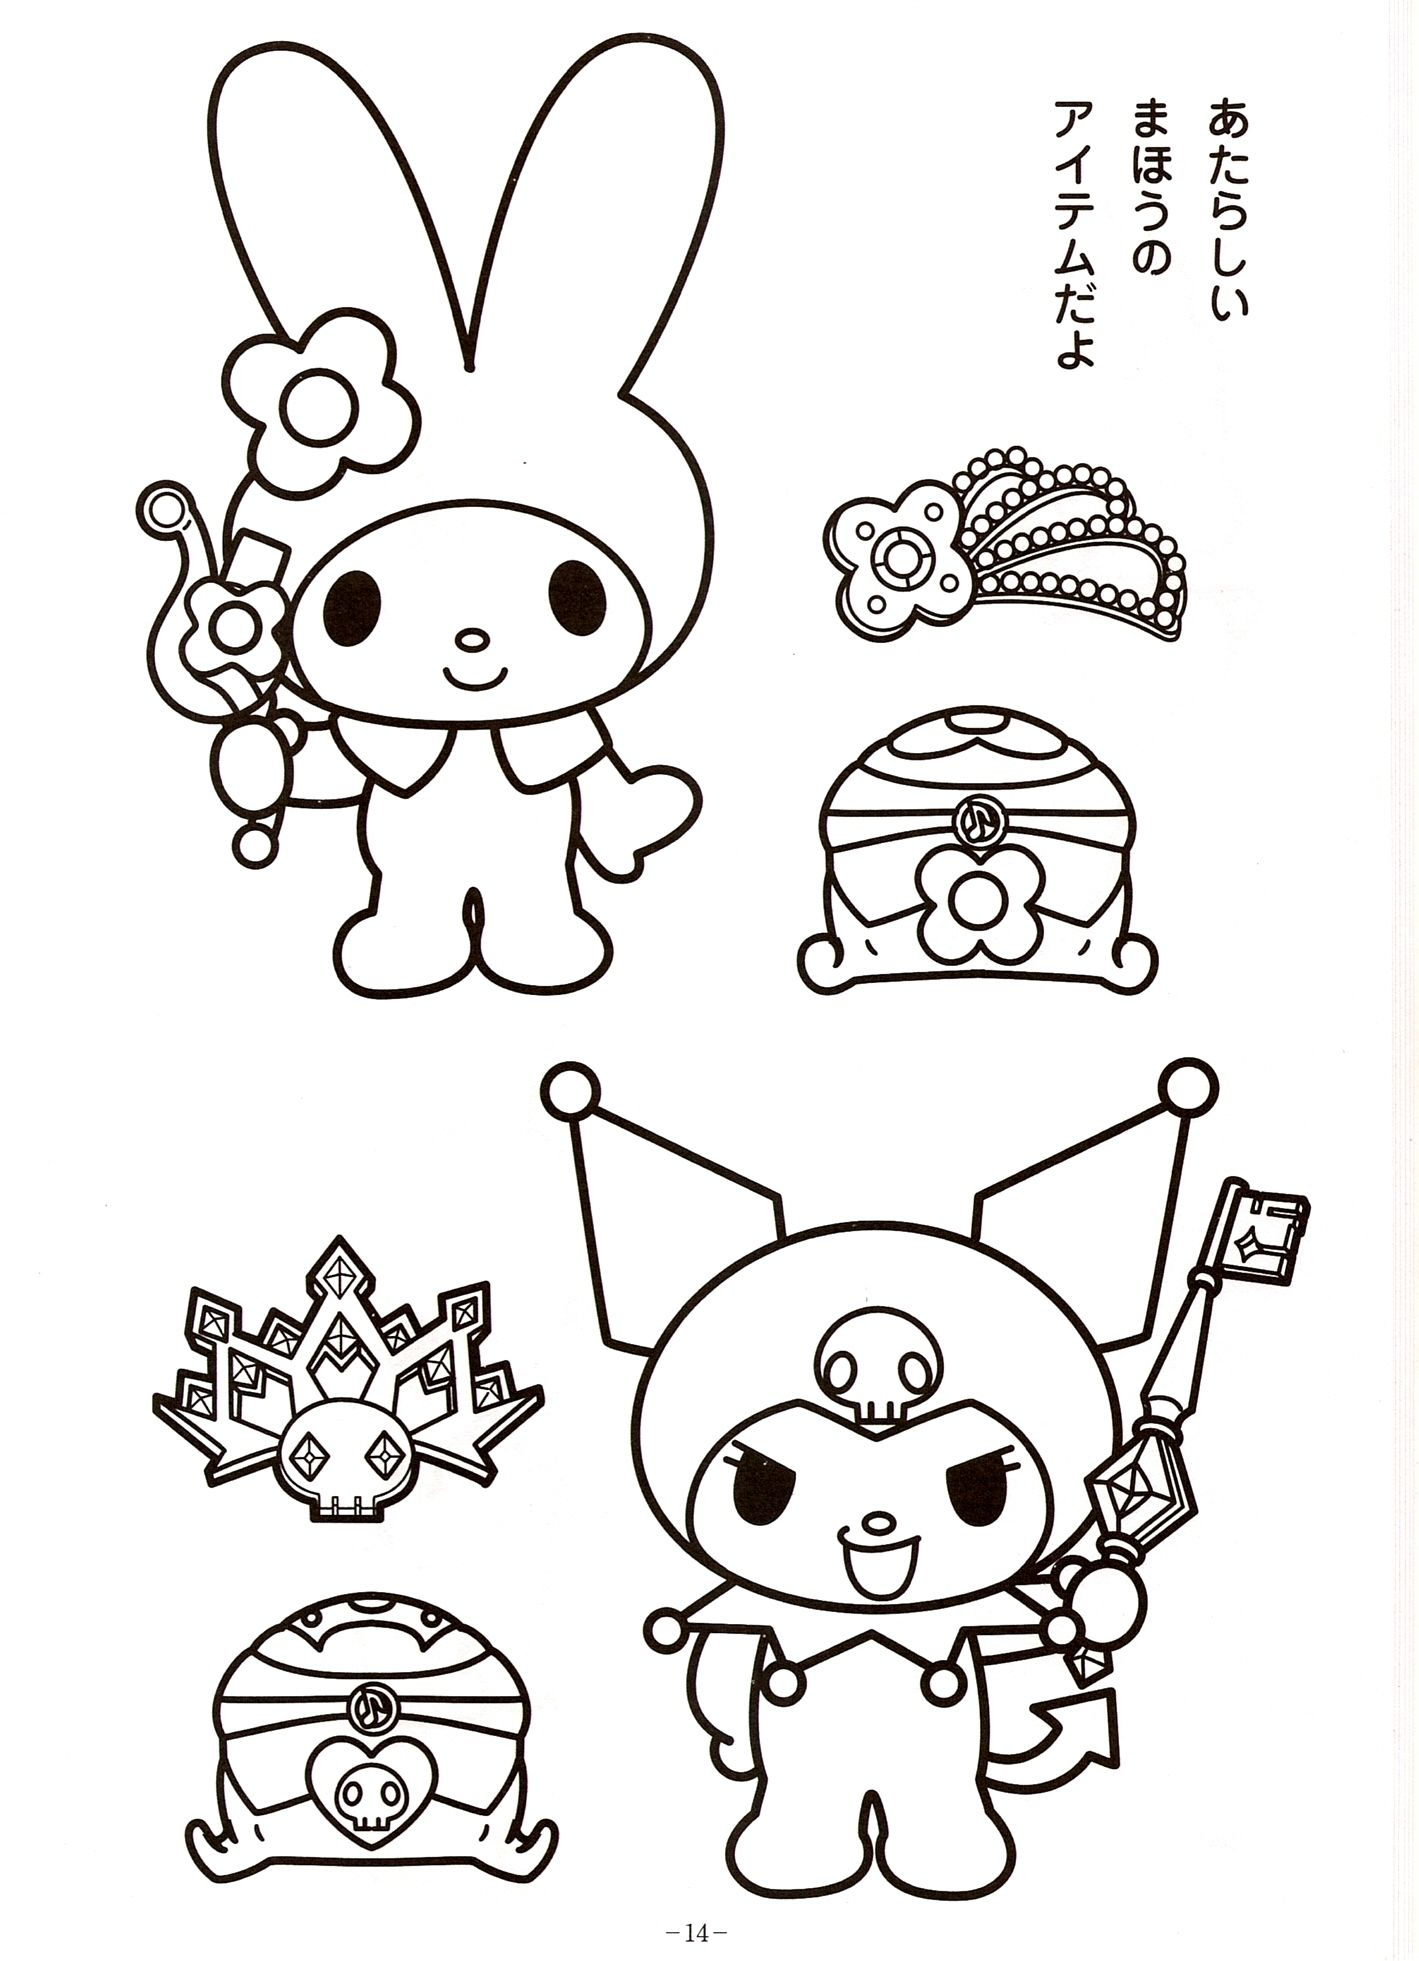 Gratis Ausmalbilder Hello Kitty : Http Www Oasidelleanime Com Minisiti Colorare My_melody Original1